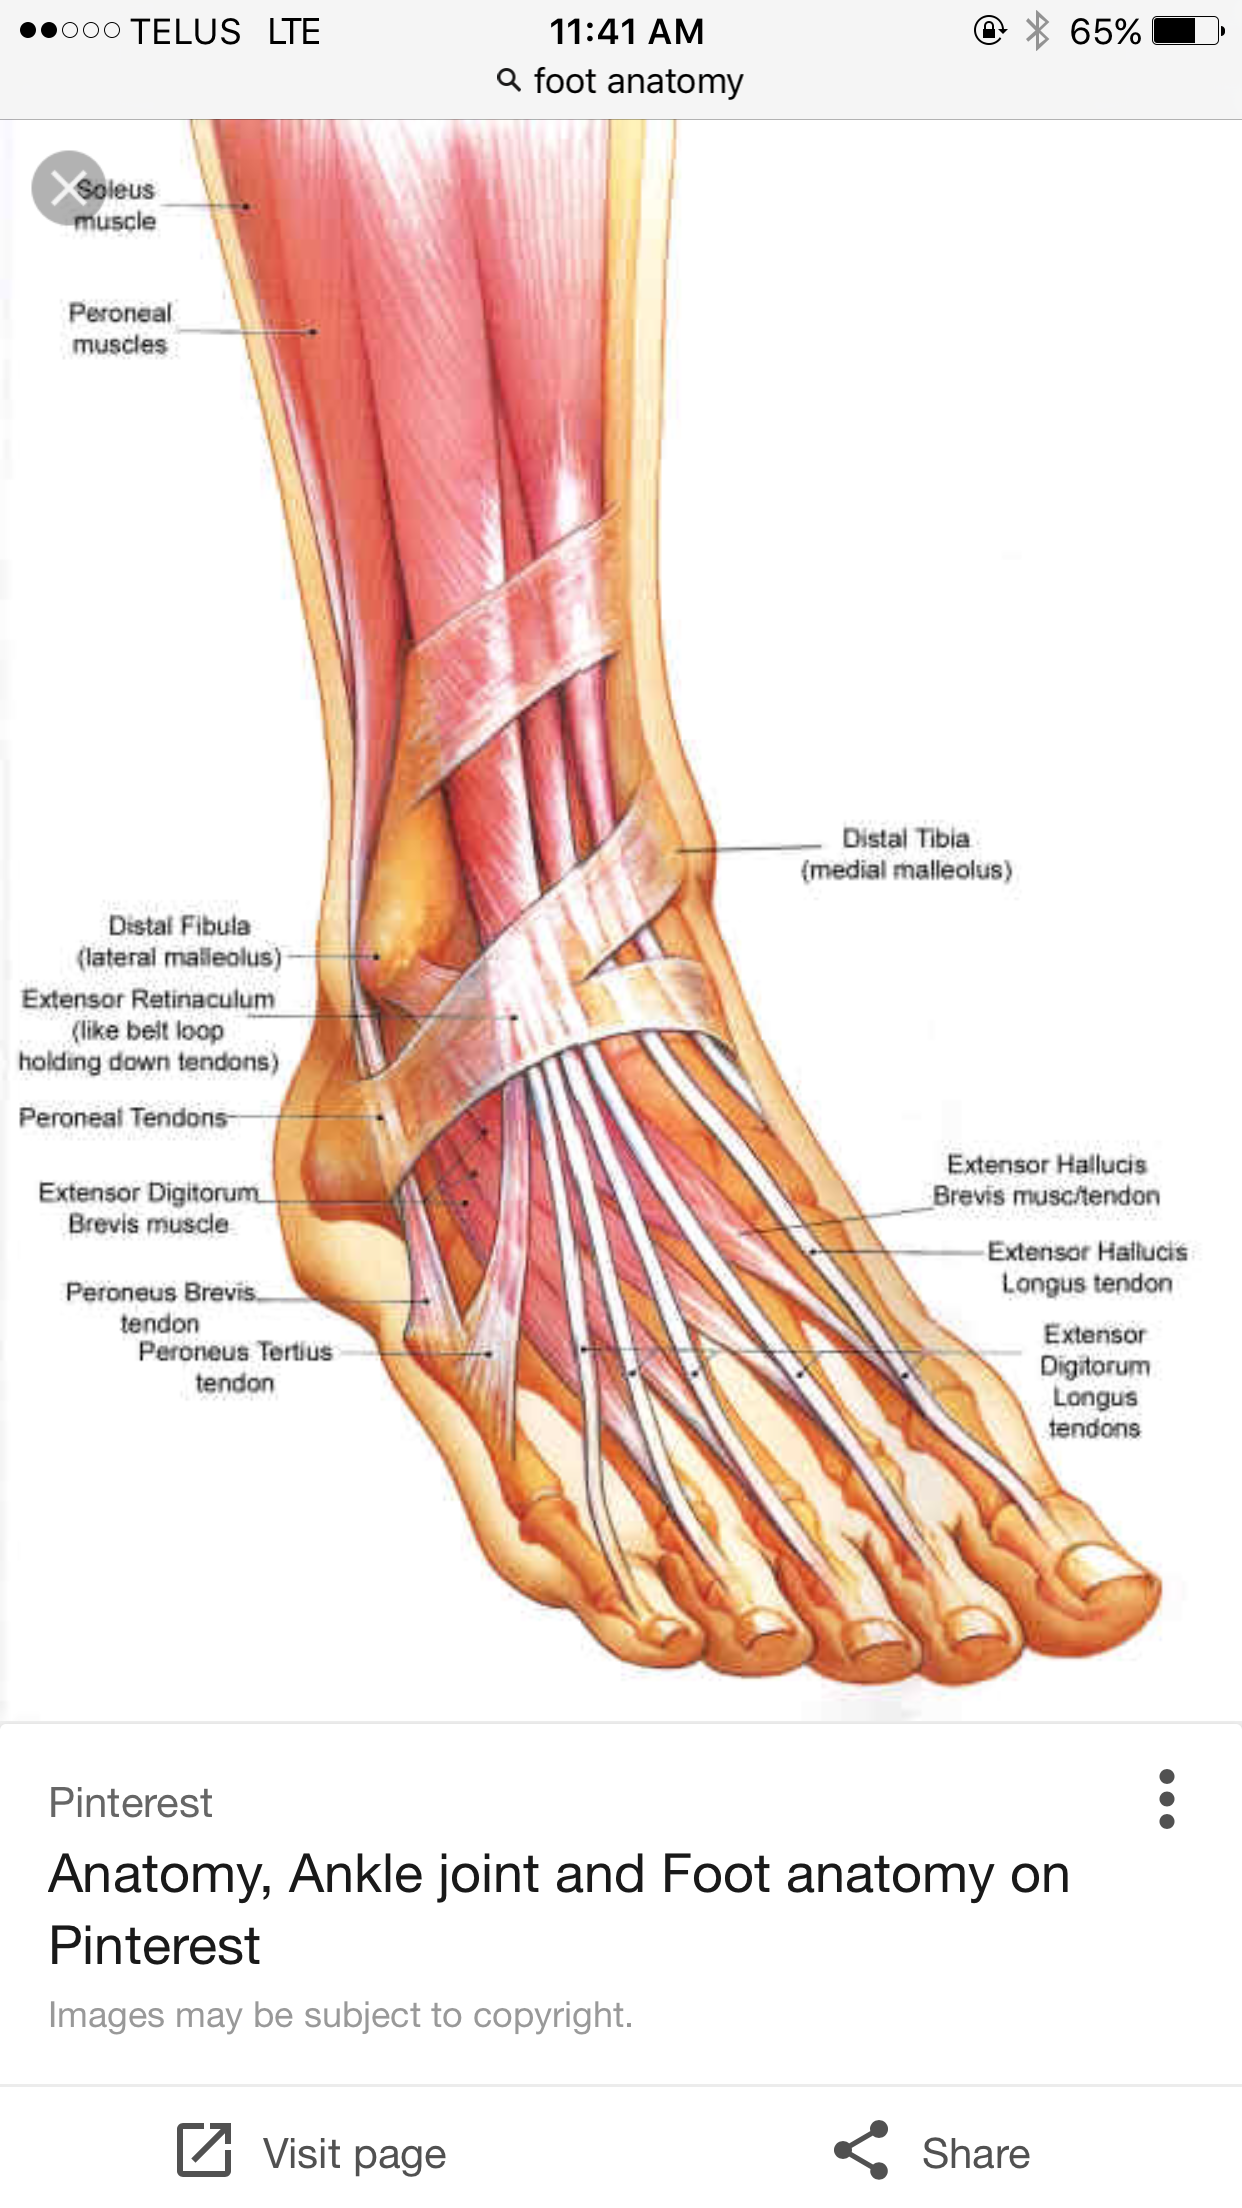 myndani ursta a fyrir latin words for nerves in feet anatomy [ 1242 x 2208 Pixel ]